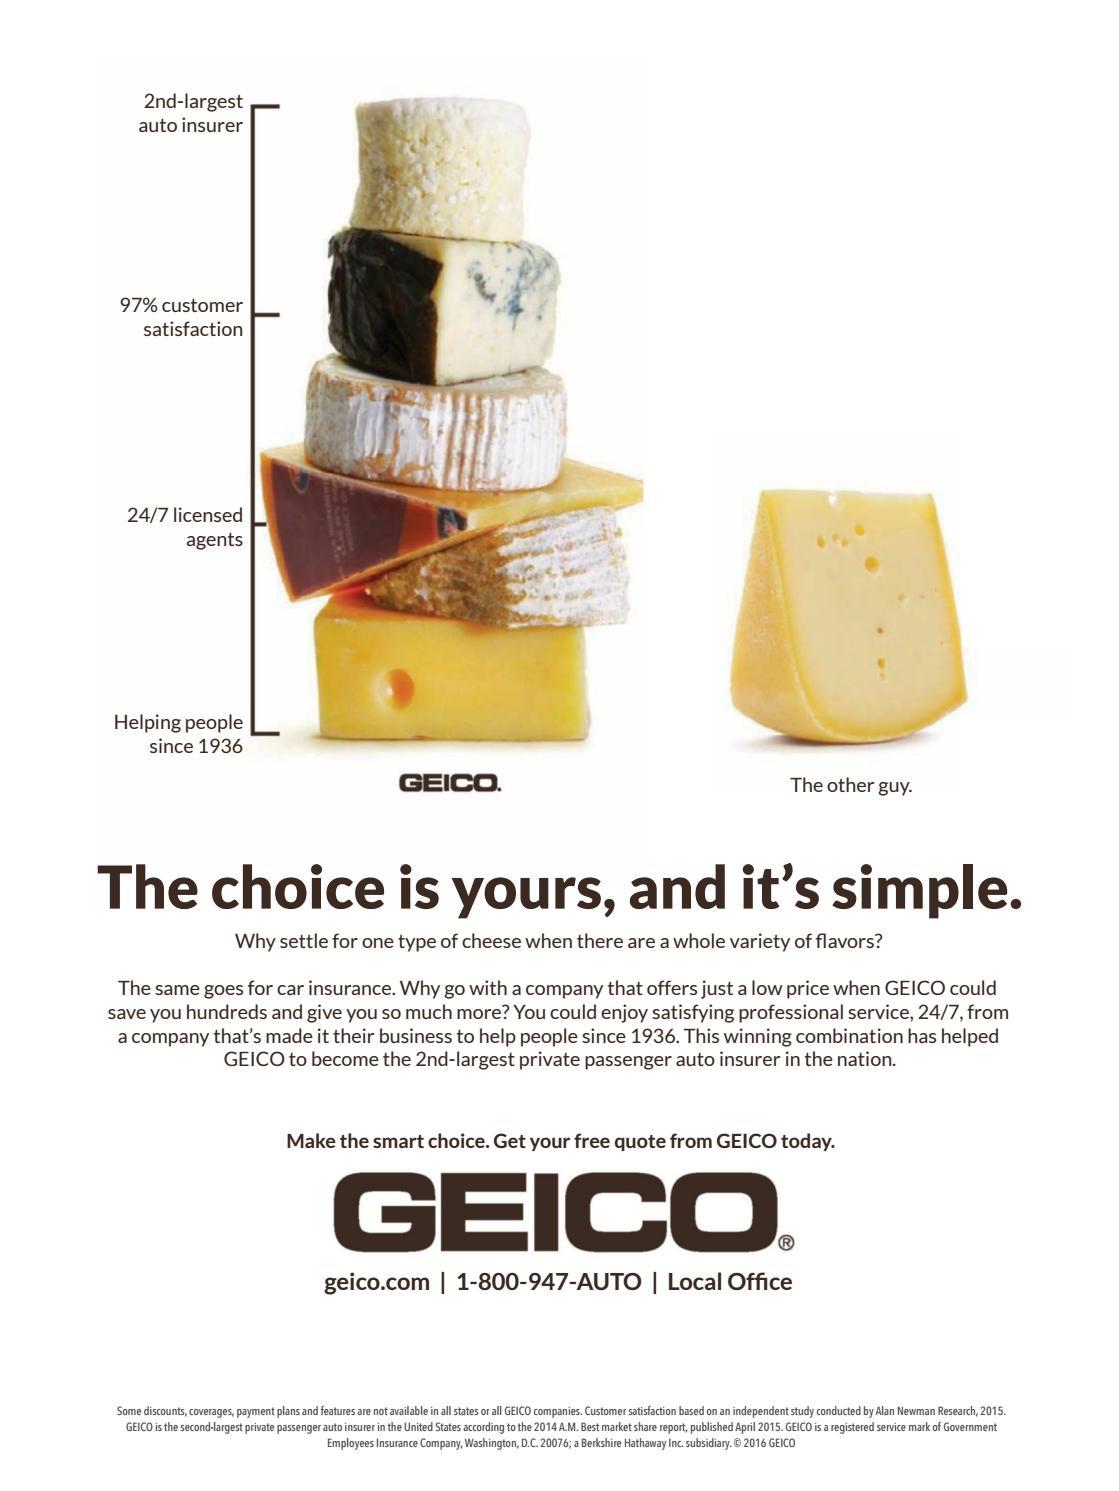 Geico Car Insurance Ad 2